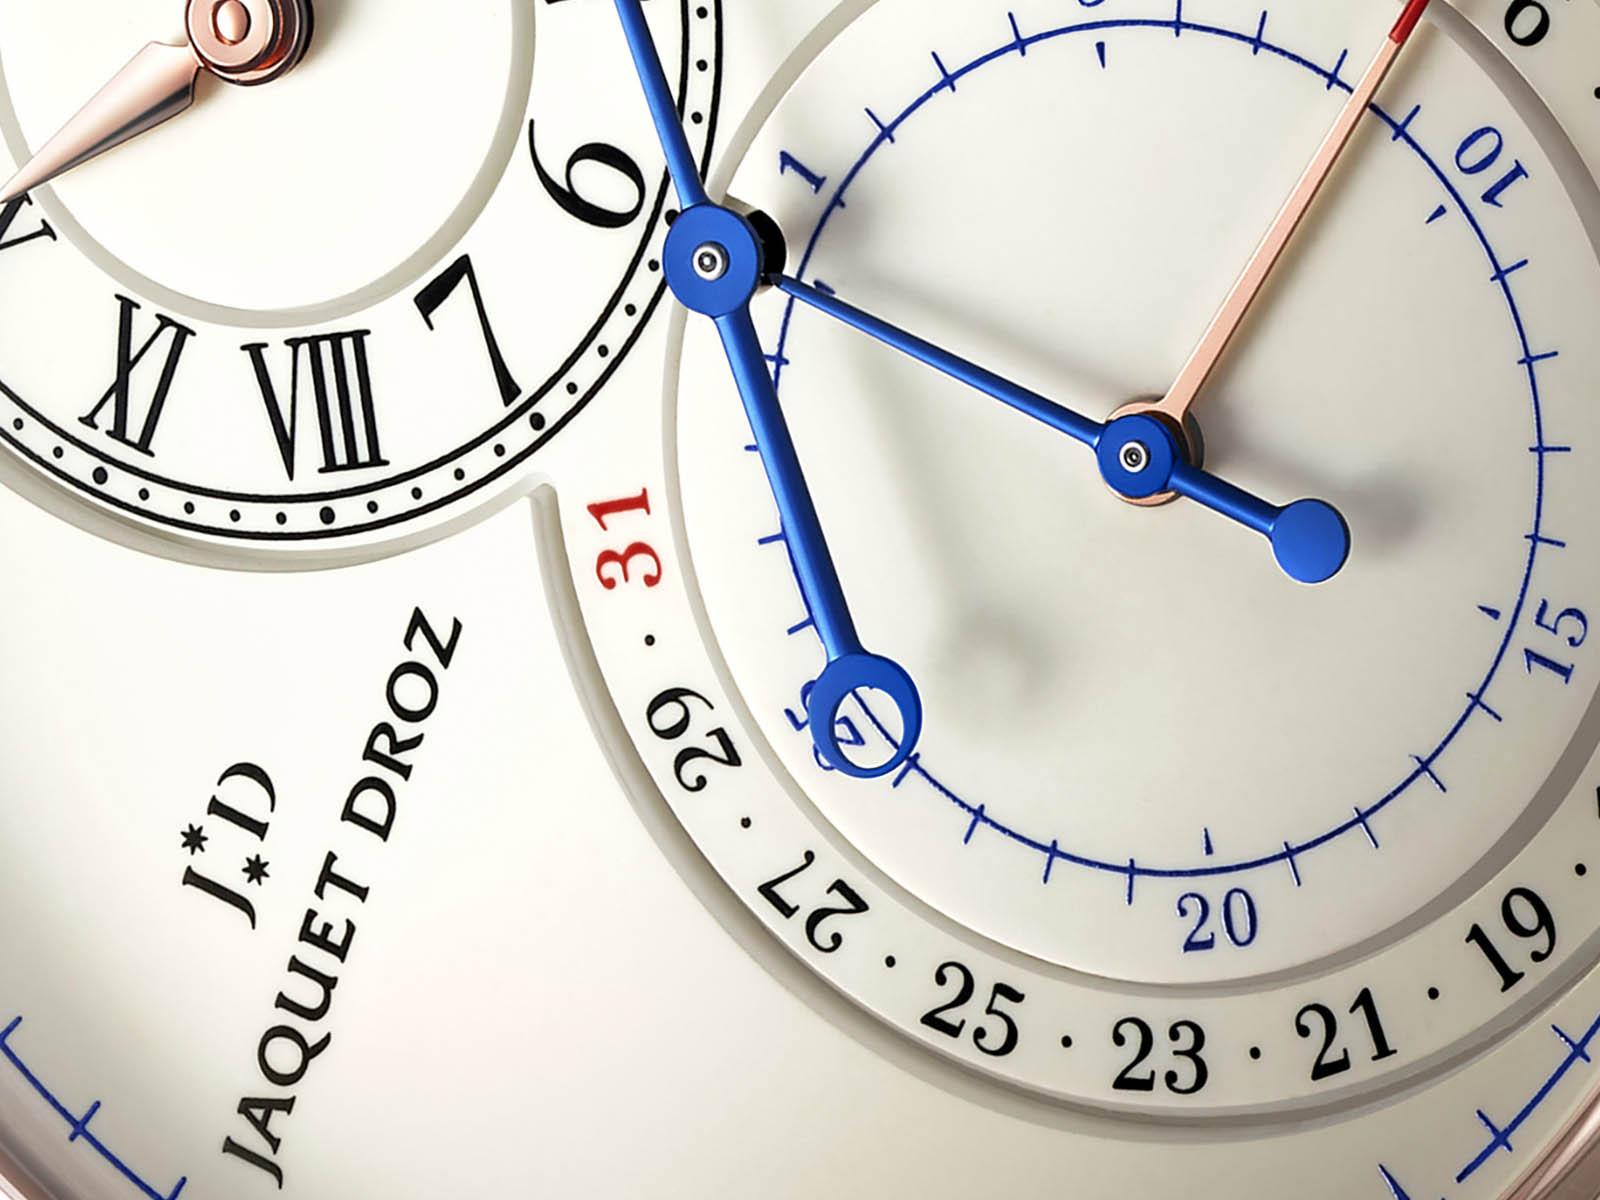 j007733200-jaquet-droz-grande-seconde-chronograph-ivory-enamel-3.jpg